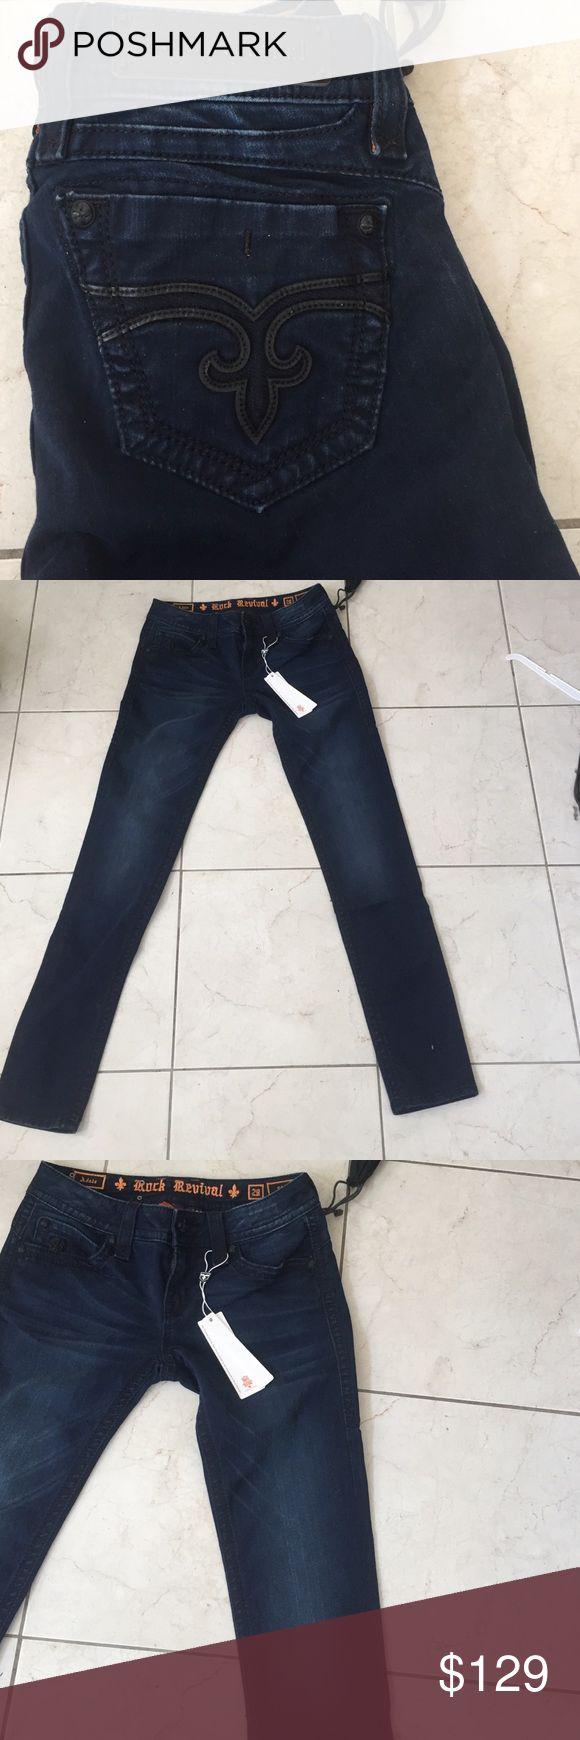 Rock revival Adele skinny women jeans 28 New Rock revival Jeans Skinny